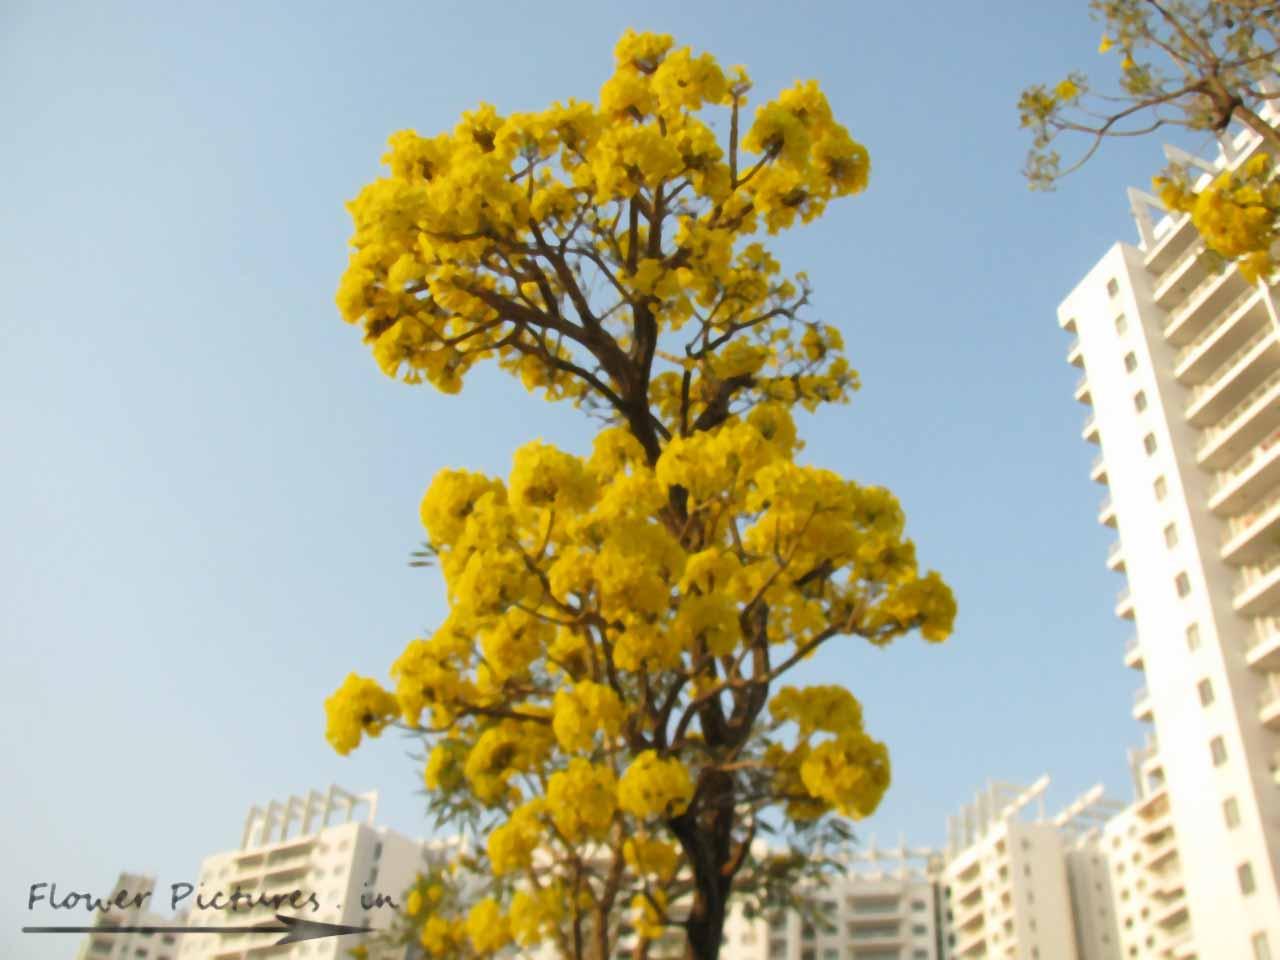 Yellow Flowers Tree 14 Background Wallpaper Hdflowerwallpaper